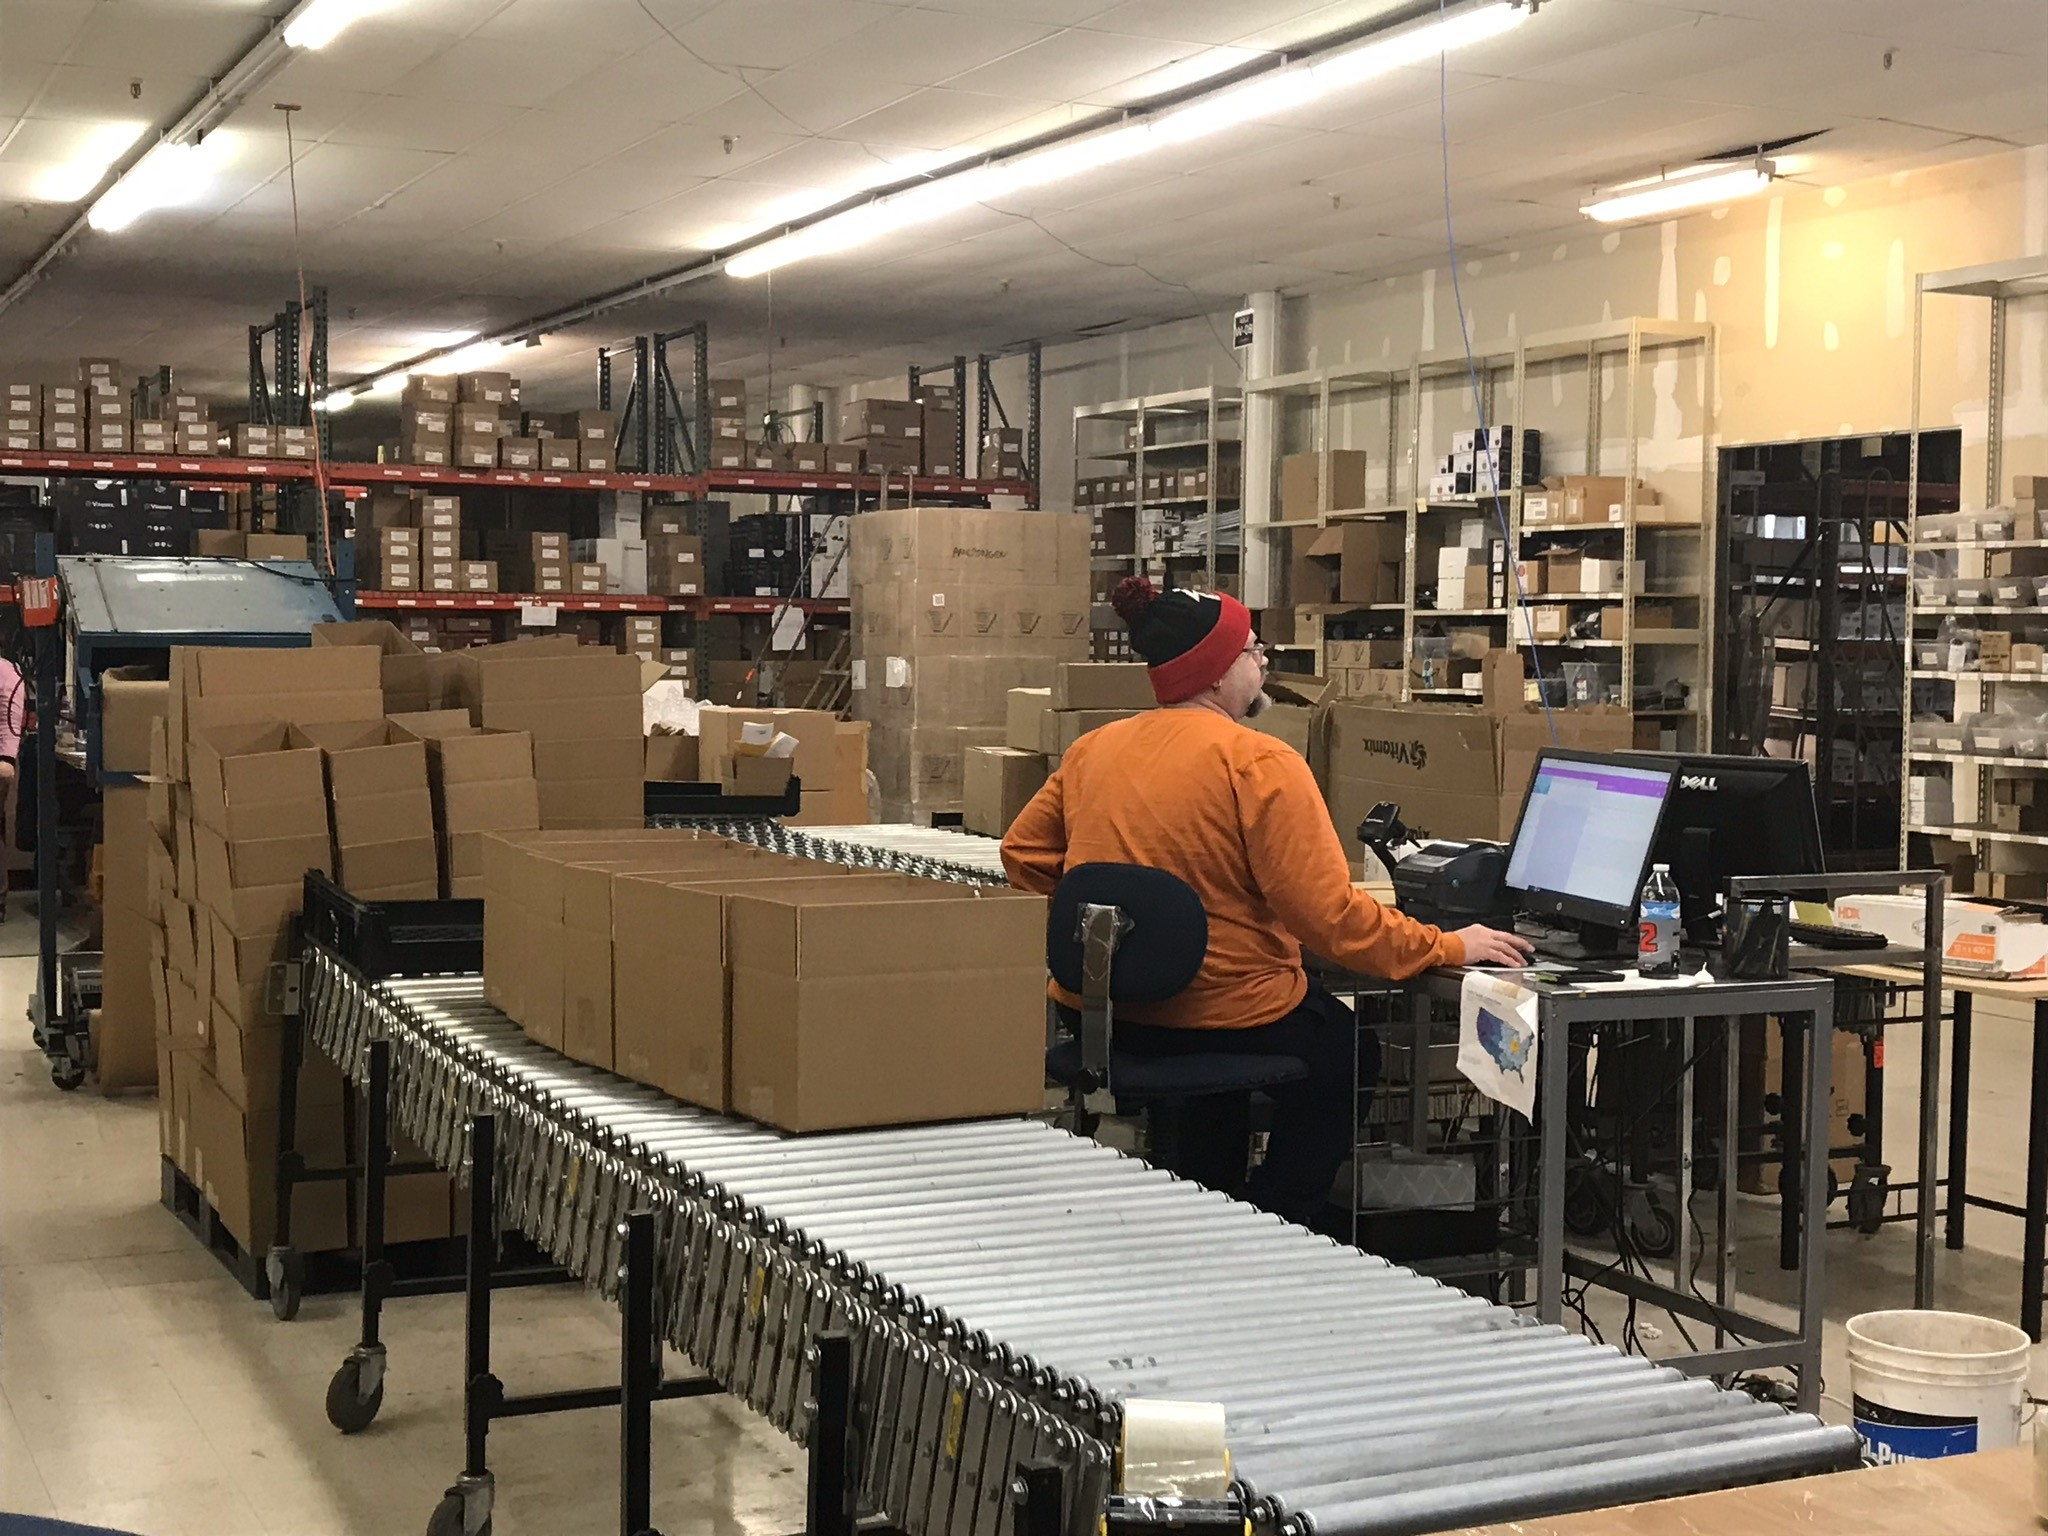 JL Hufford Warehouse Operations | LinkedIn